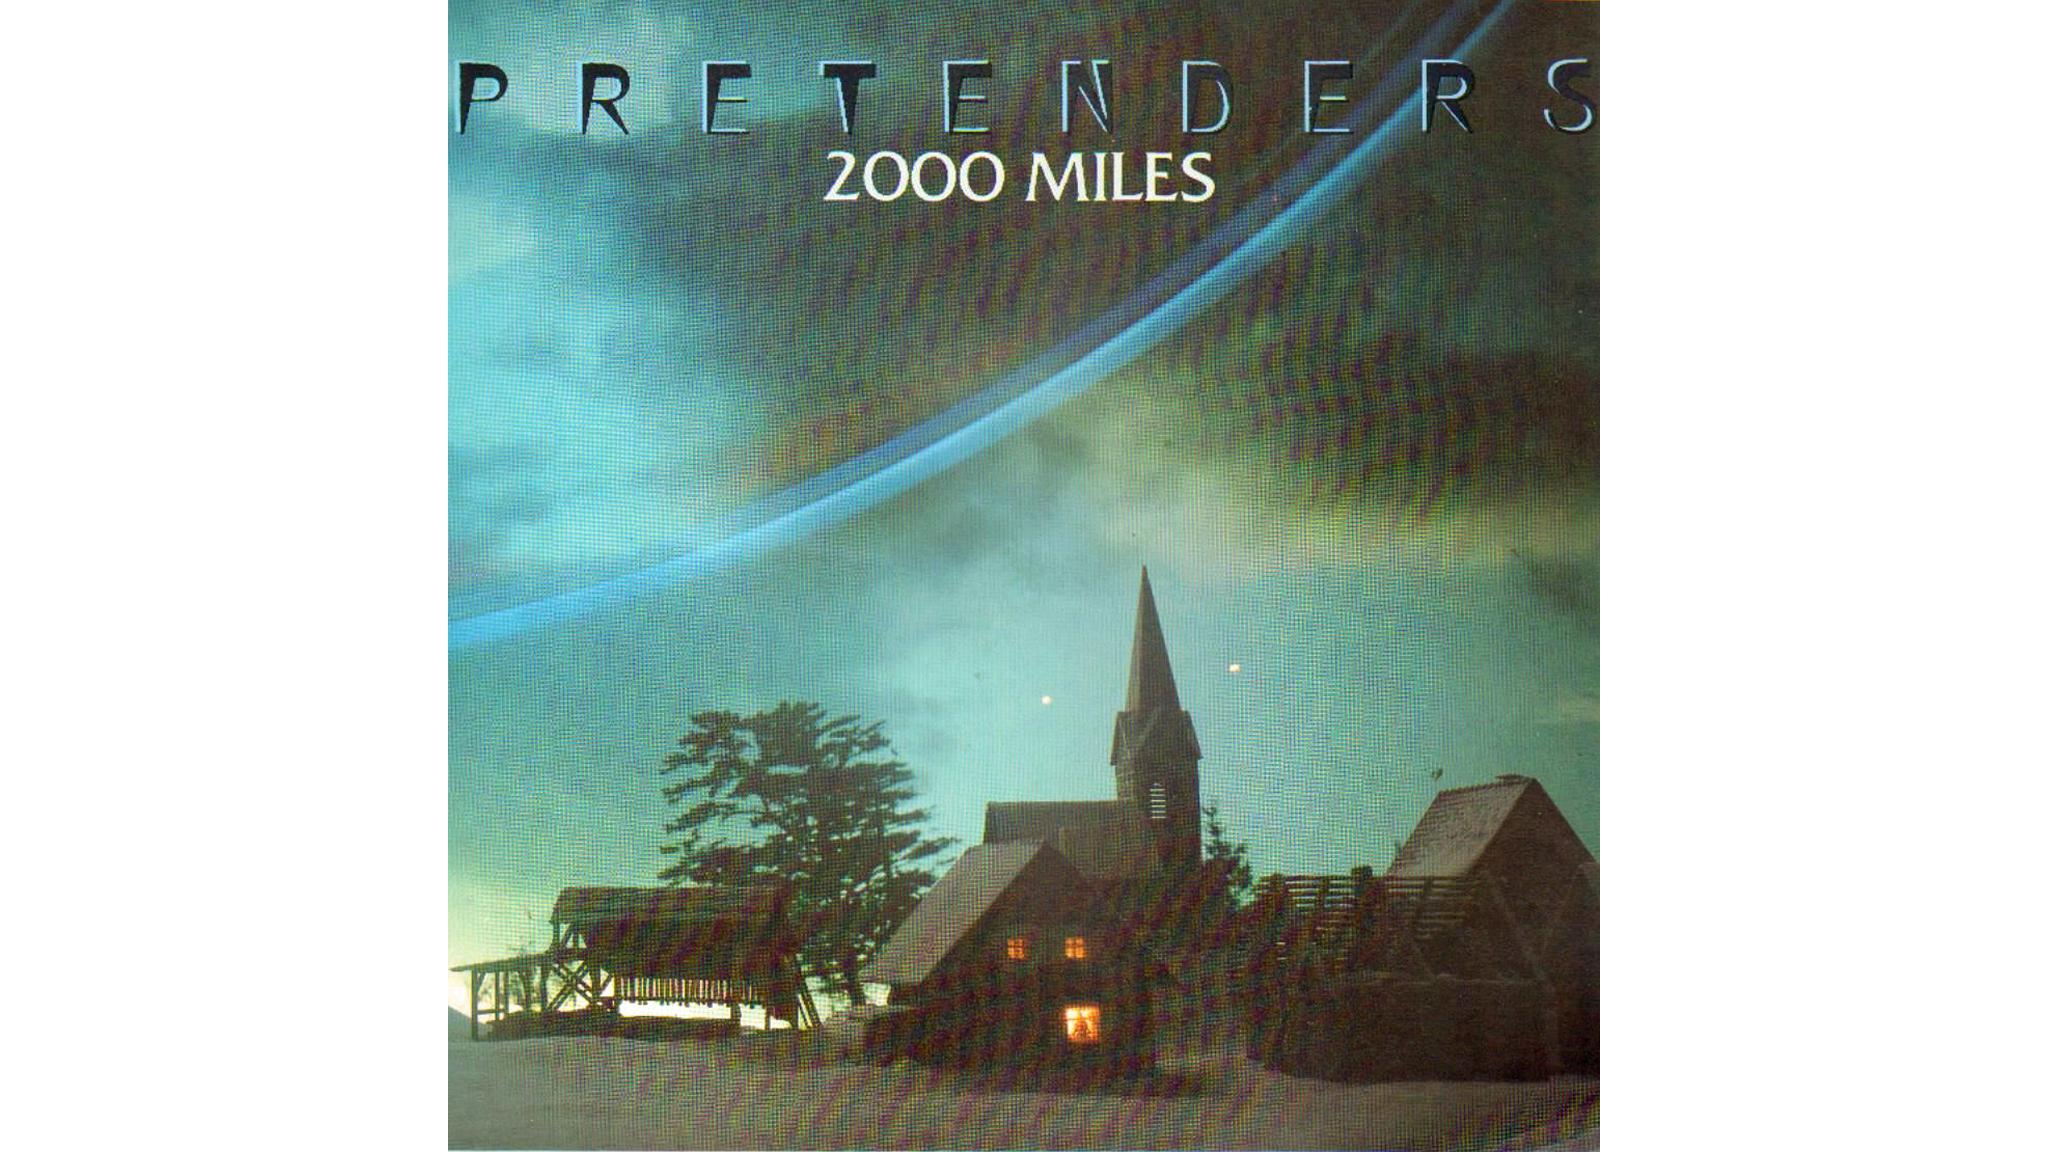 Pretenders –'2000 Miles' artwork